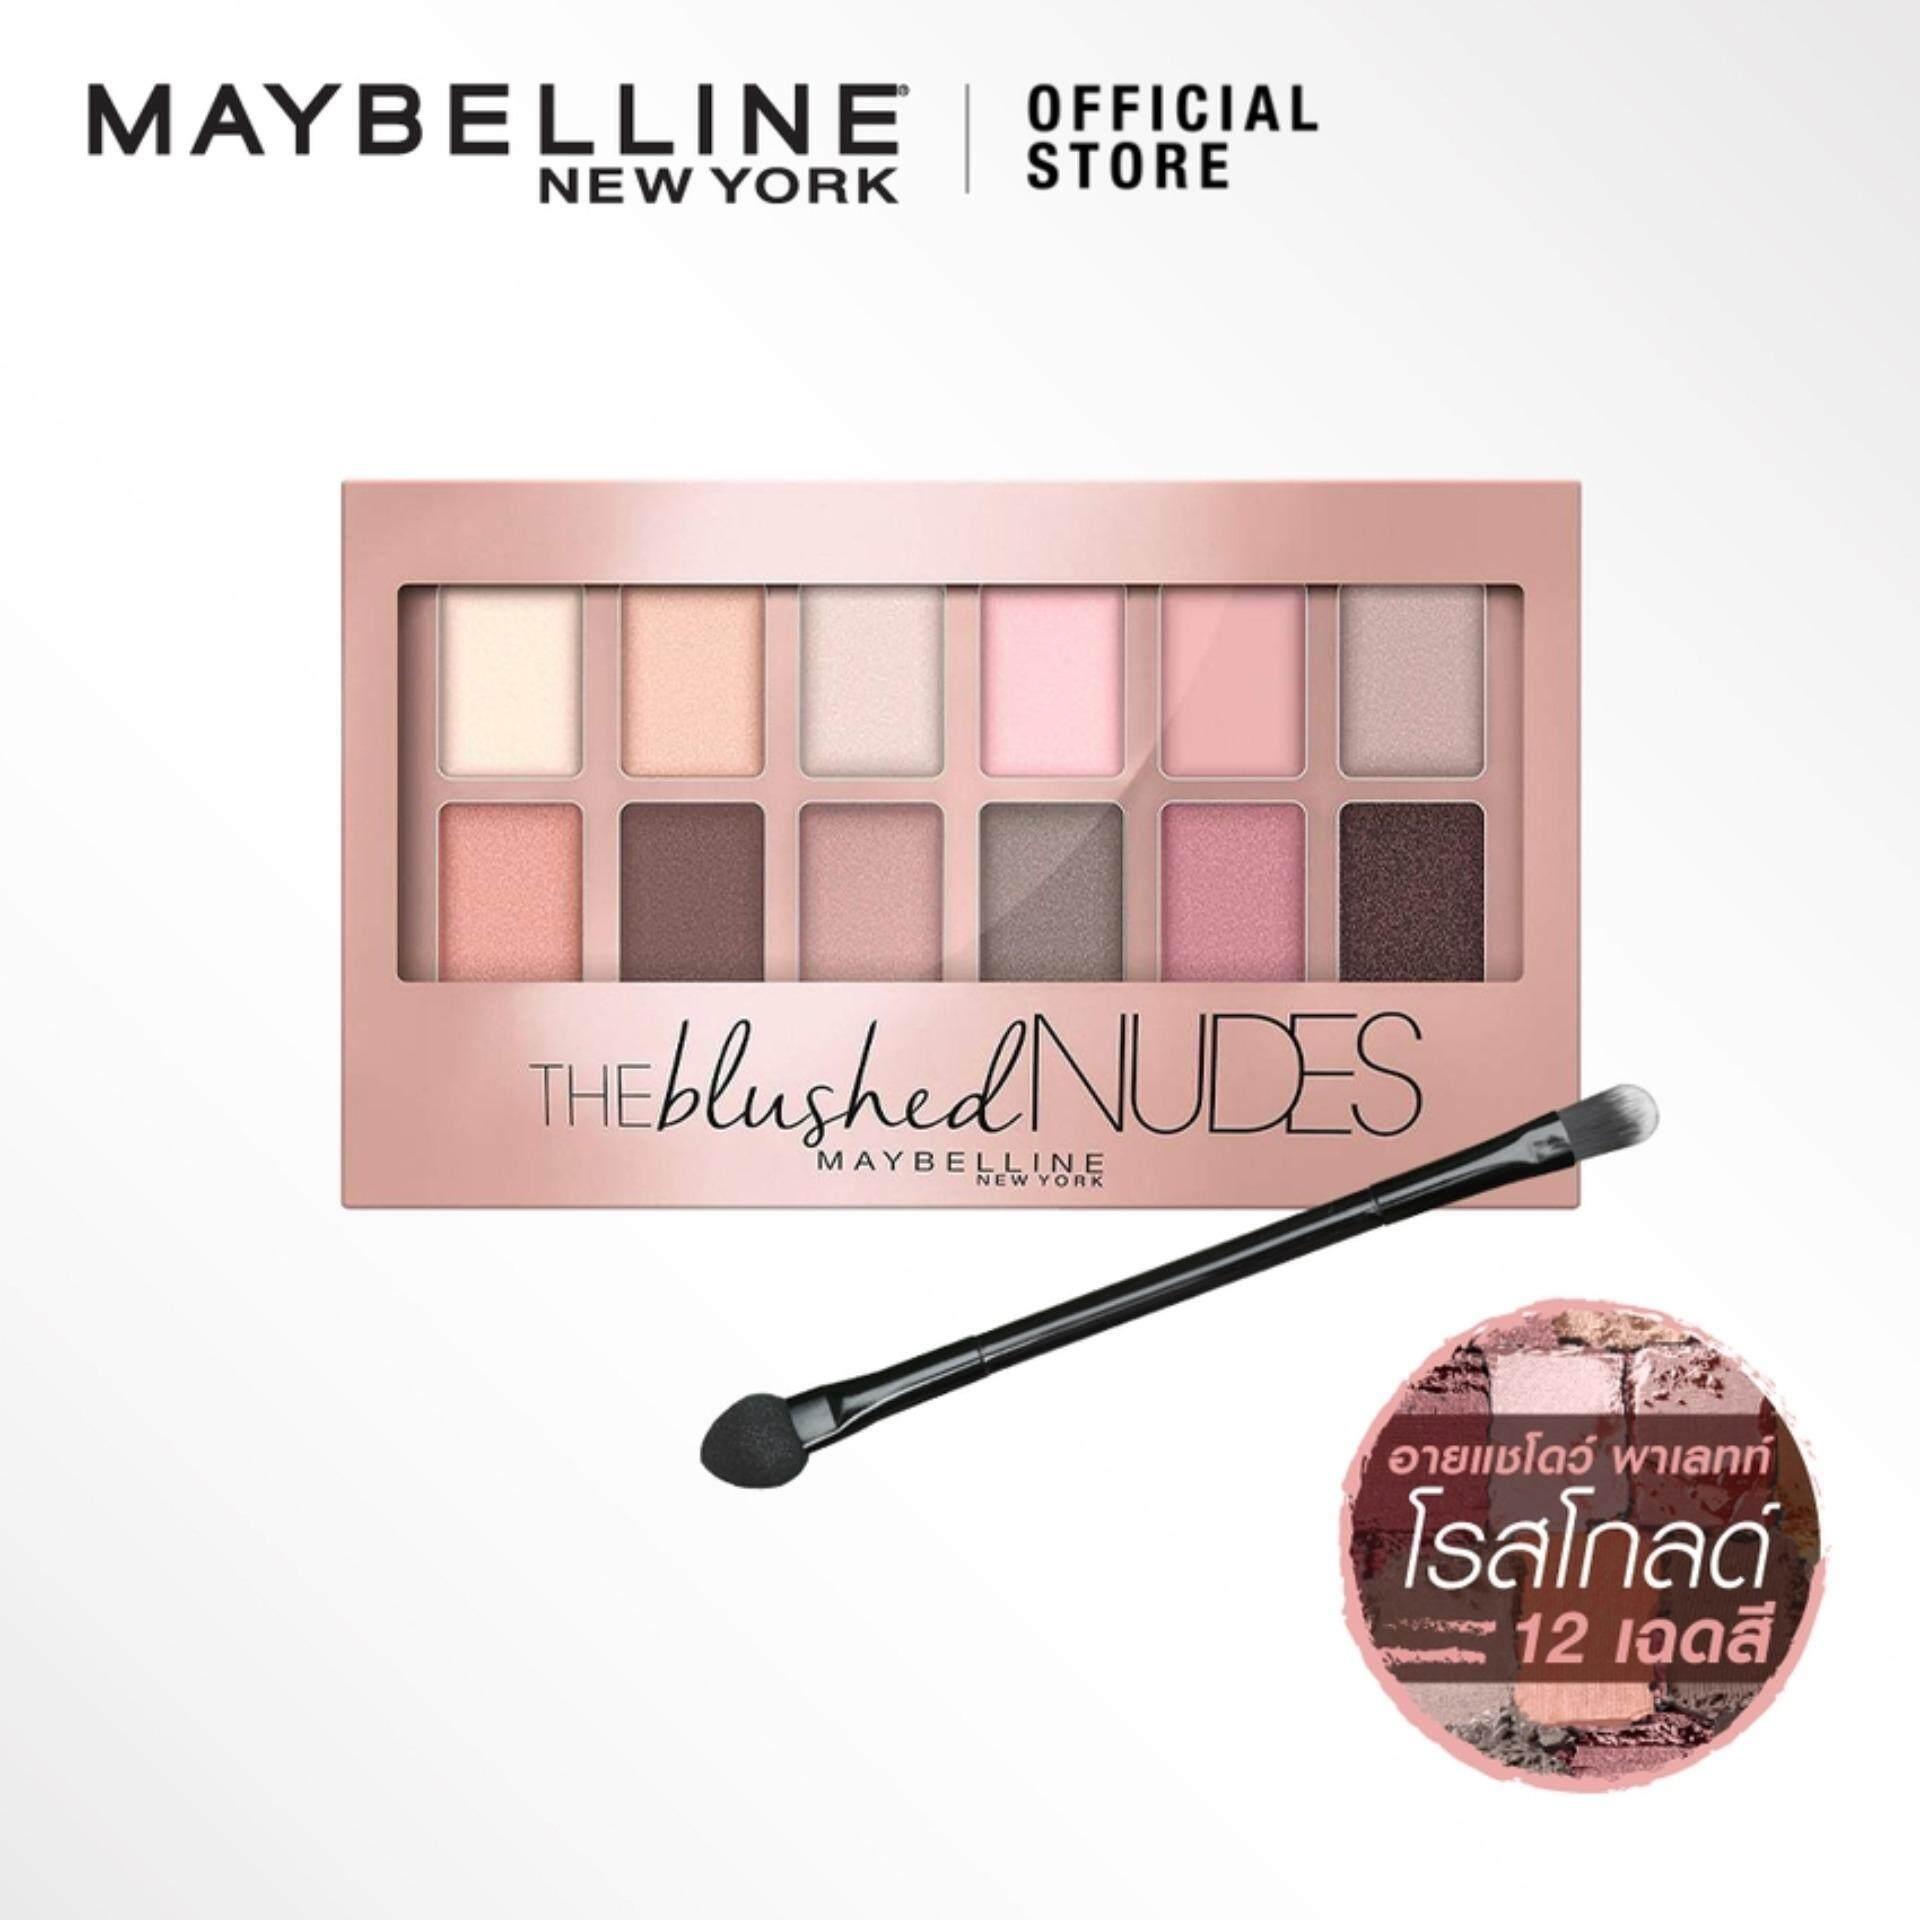 Bestselling : เมย์เบลลีน นิวยอร์ก เดอะ บลัช นู้ดส์ อายแชโดว์พาเลทท์ 9 กรัม Maybelline New York The Blushed Nudes Palette 9 G(เครื่องสำอาง,พาเลทแต่งหน้า,อายแชโดว์, อายแชโดว์ พาเลท) By Maybelline Thailand.